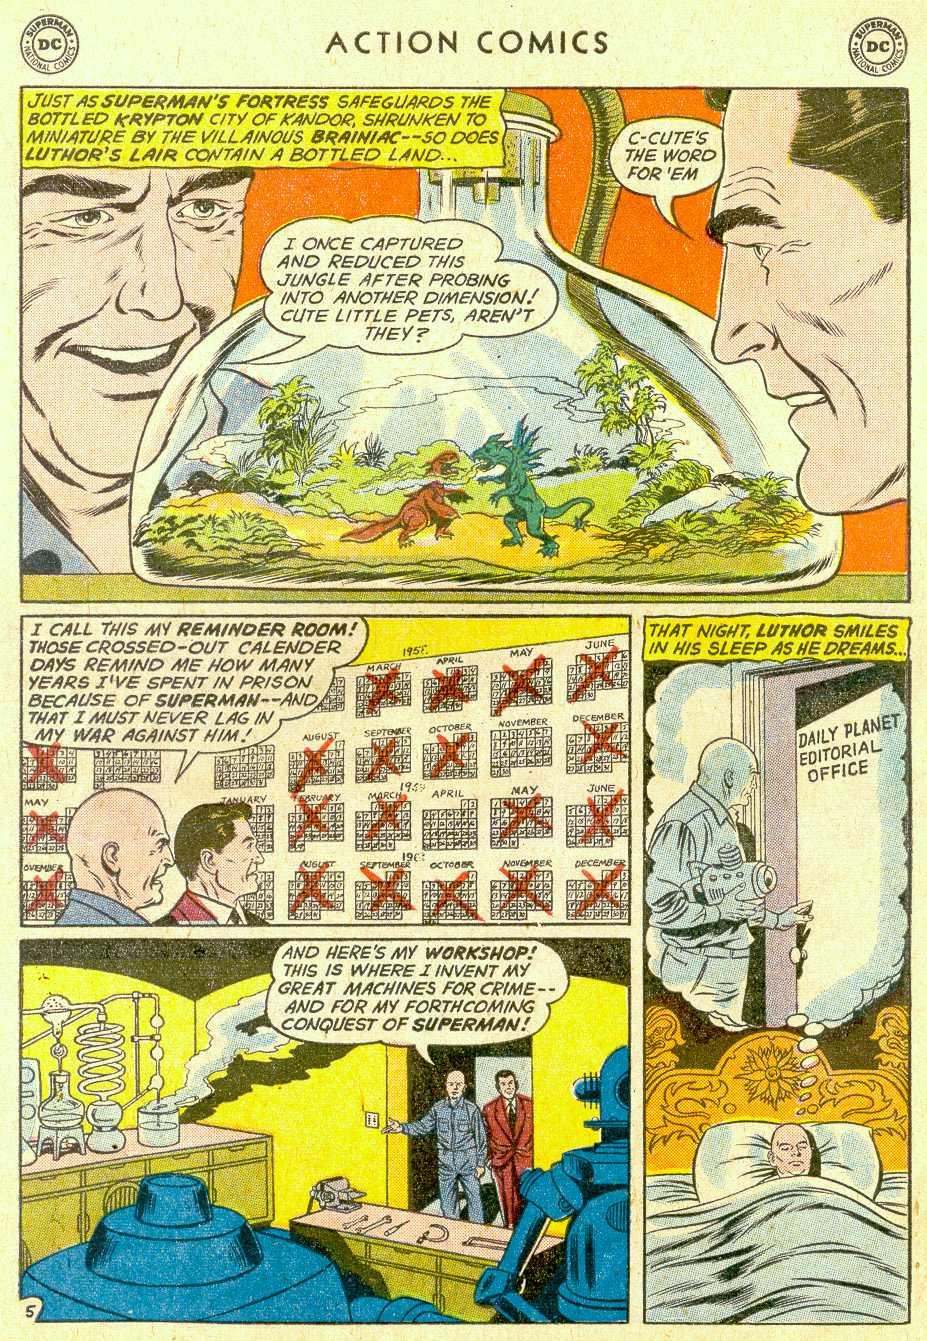 Action Comics (1938) 277 Page 6